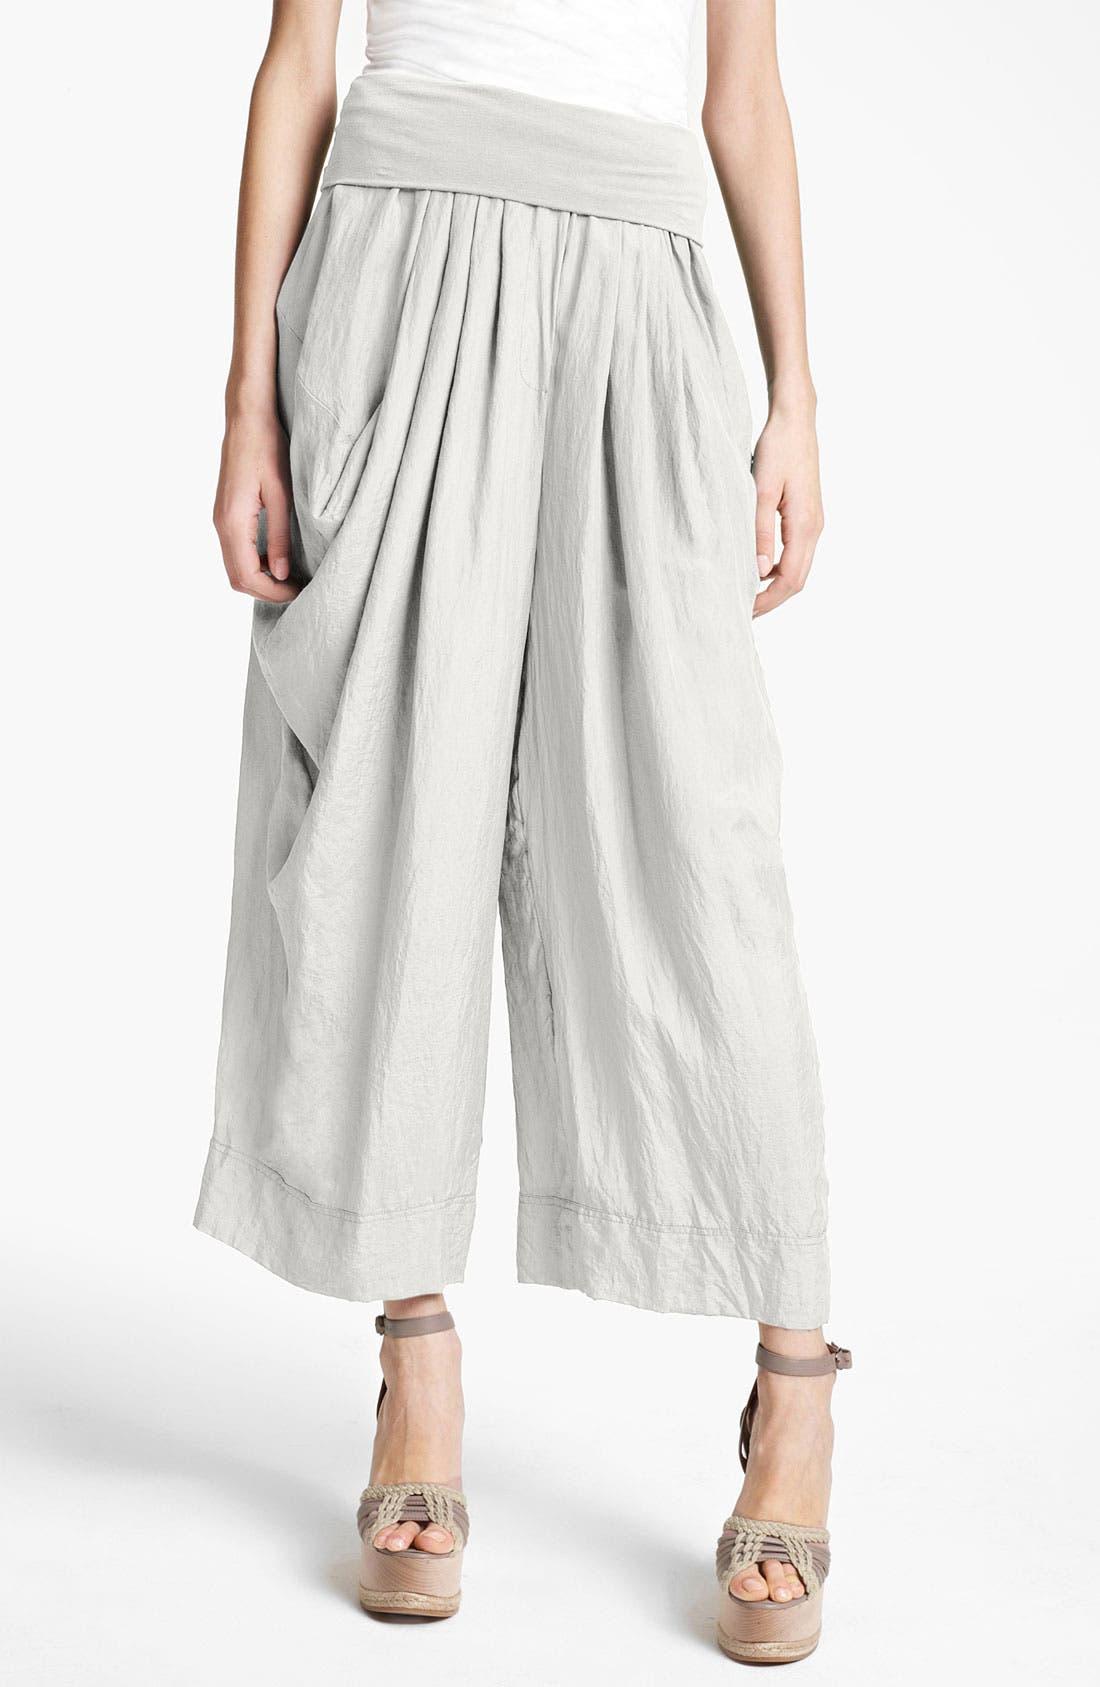 Alternate Image 1 Selected - Donna Karan Collection Draped Gaucho Pants